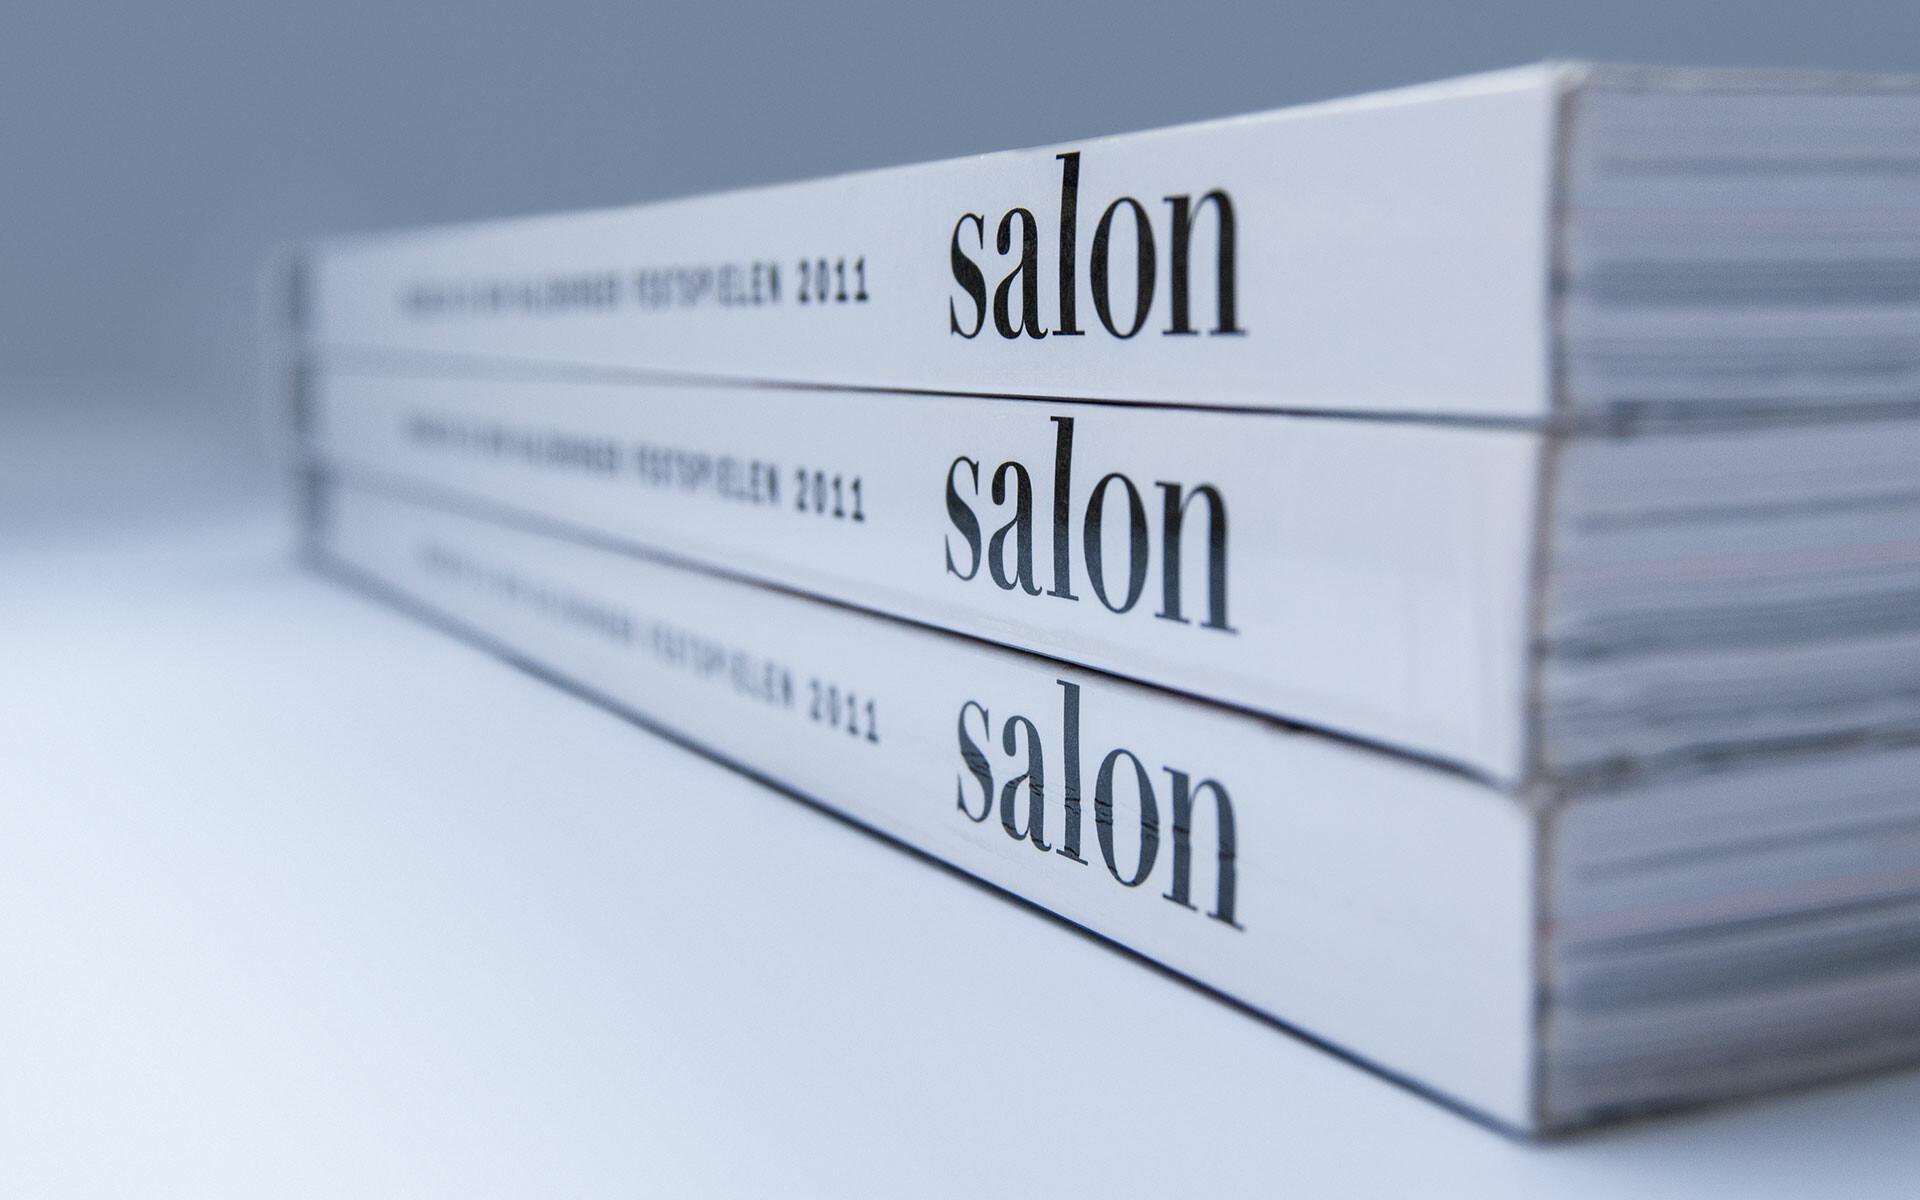 Salon 2011 – stack of magazines